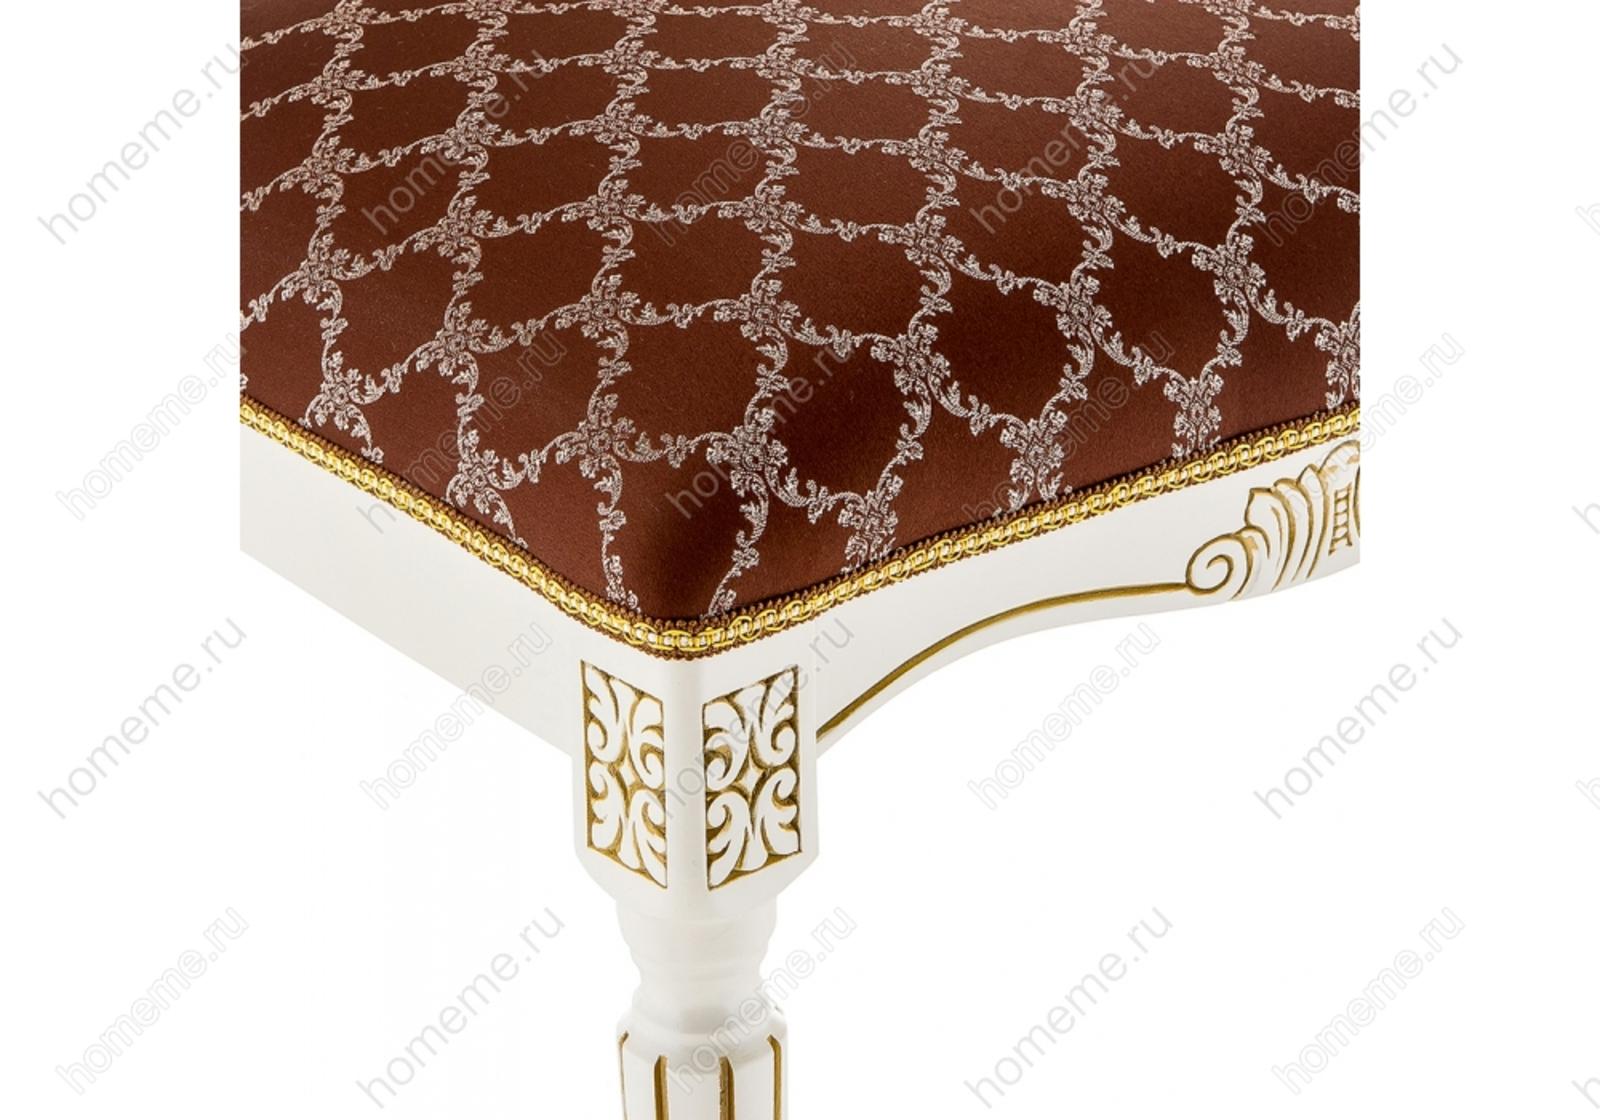 Стул деревянный Лино патина золото / шоколад 309310 Лино патина золото / шоколад 309310 (15328)